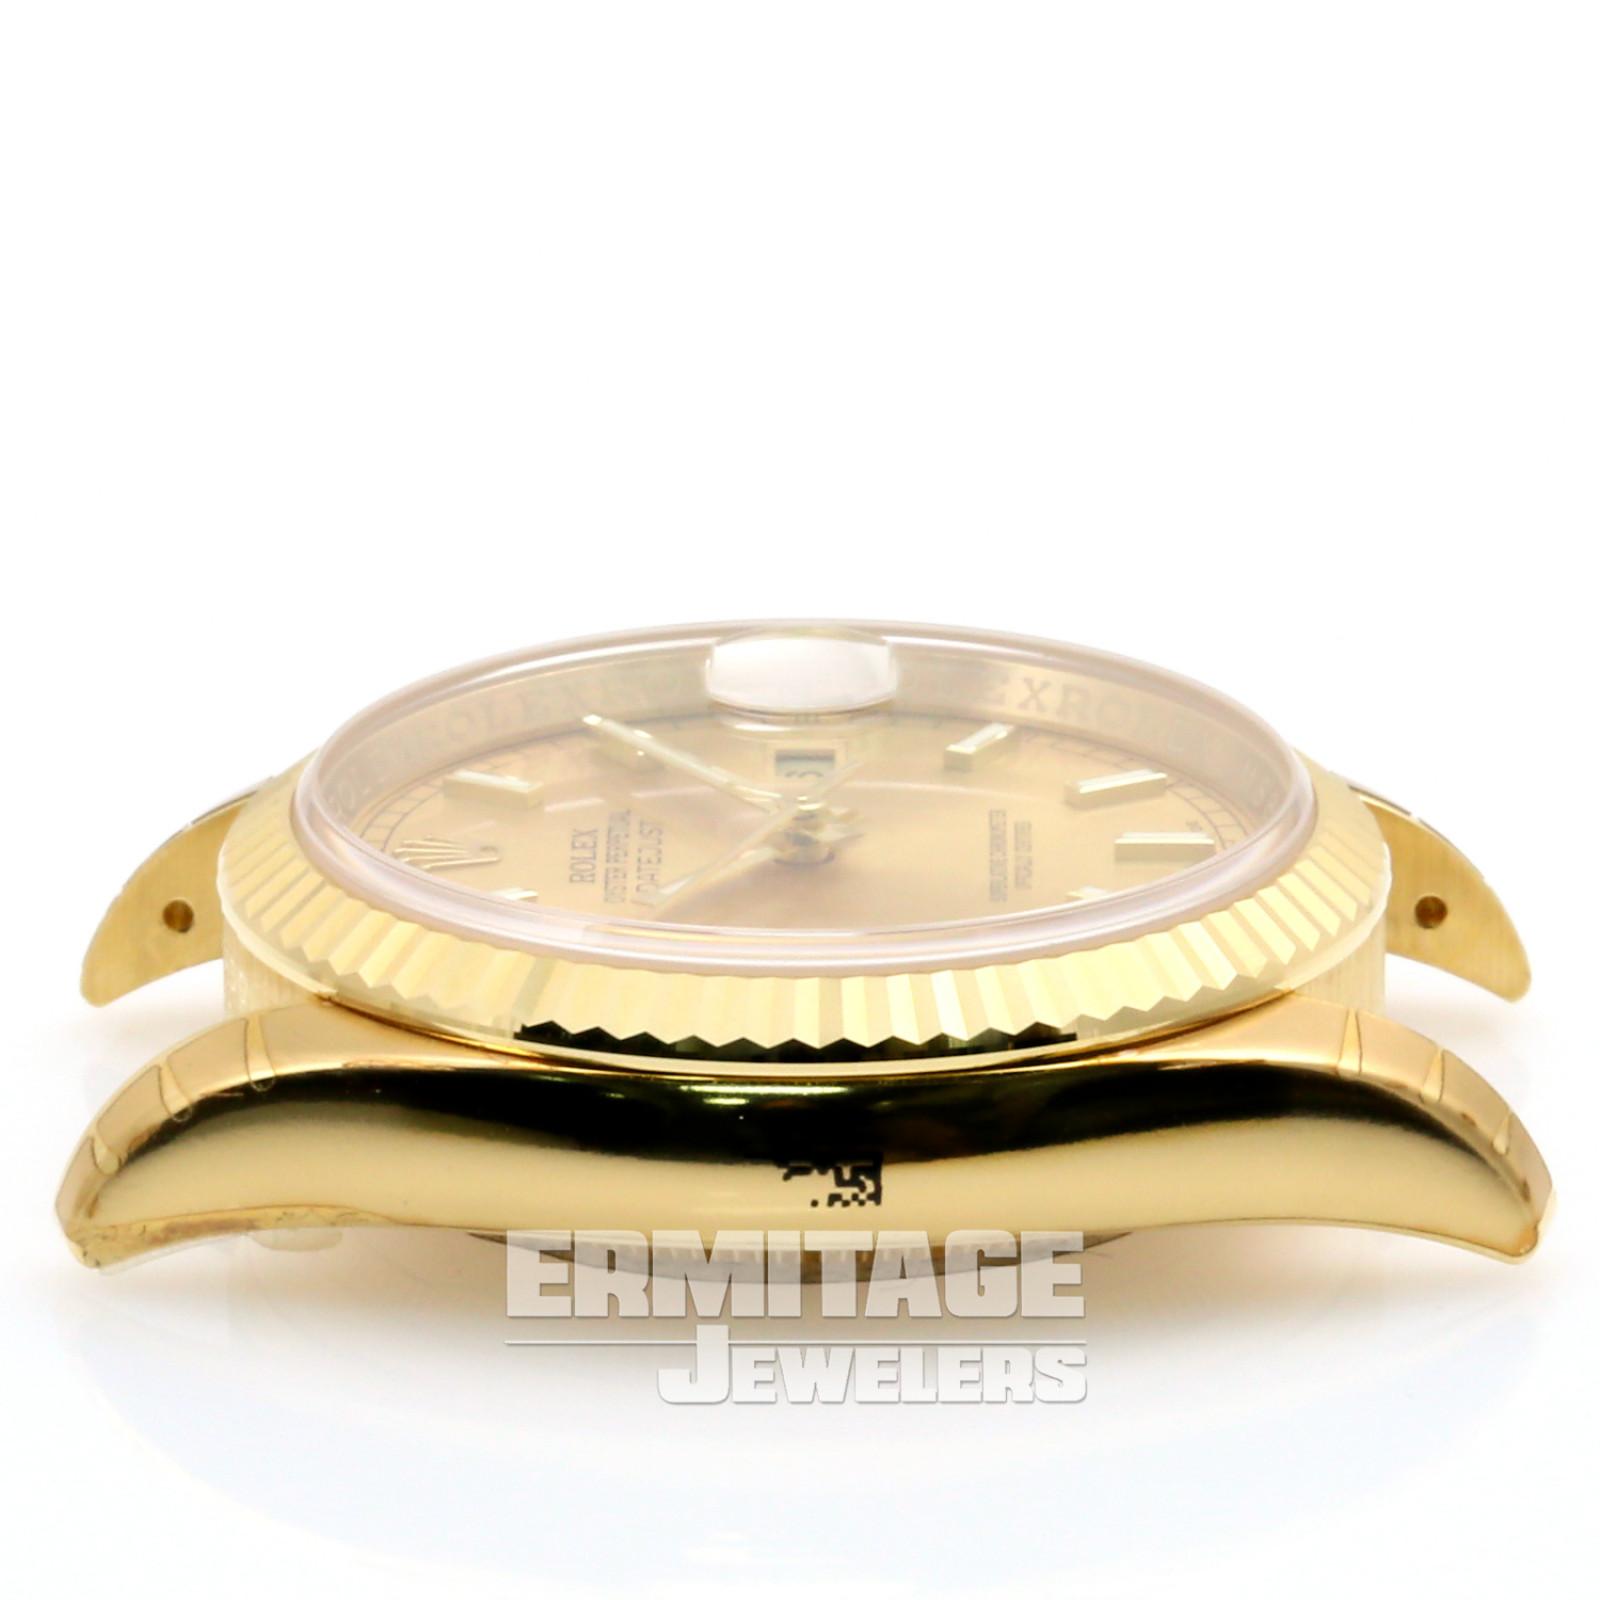 Unworn Gold Rolex Datejust 116238 in Jubilee